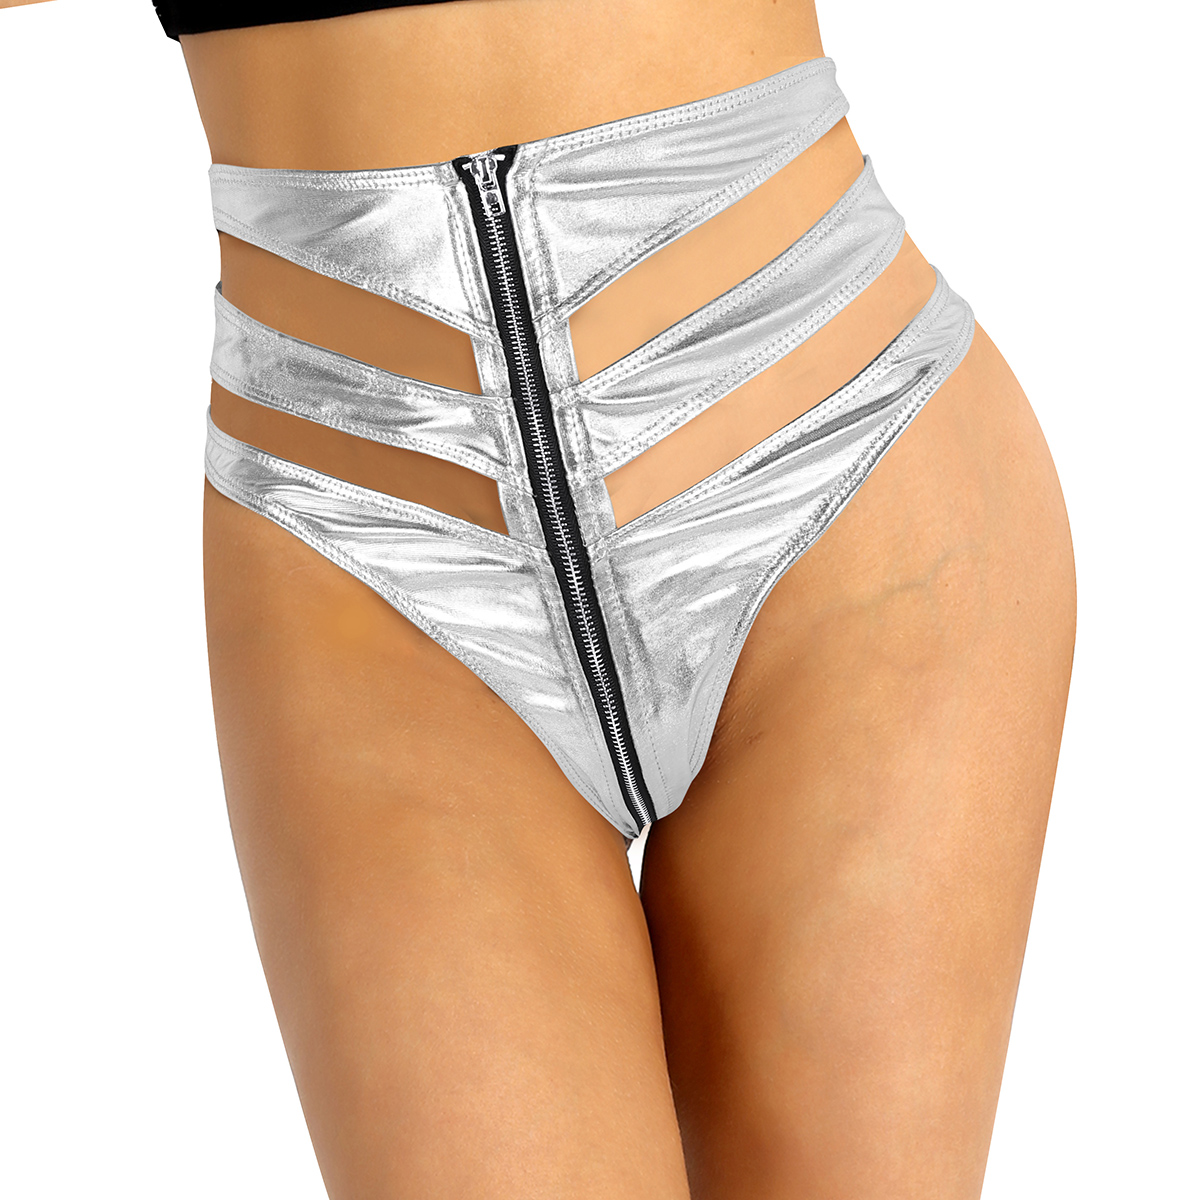 CHICTRY Womens Shiny Leather Zipper Crotch Mini Booty Shorts Bikini Briefs Hot Pants Underwear